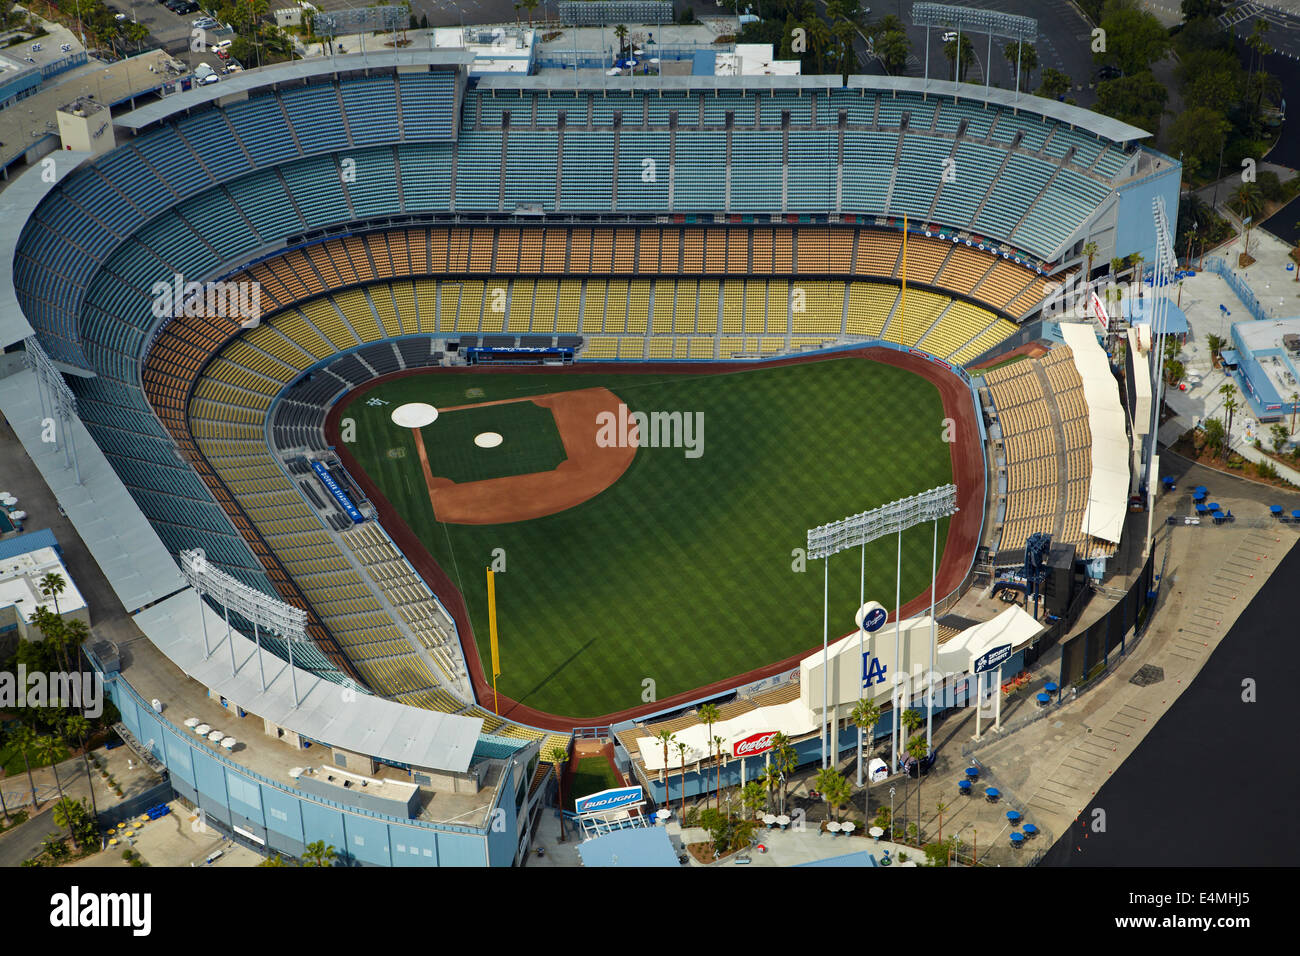 Dodger Stadium, home of the Los Angeles Dodgers baseball team, Los Angeles, California, USA - aerial - Stock Image